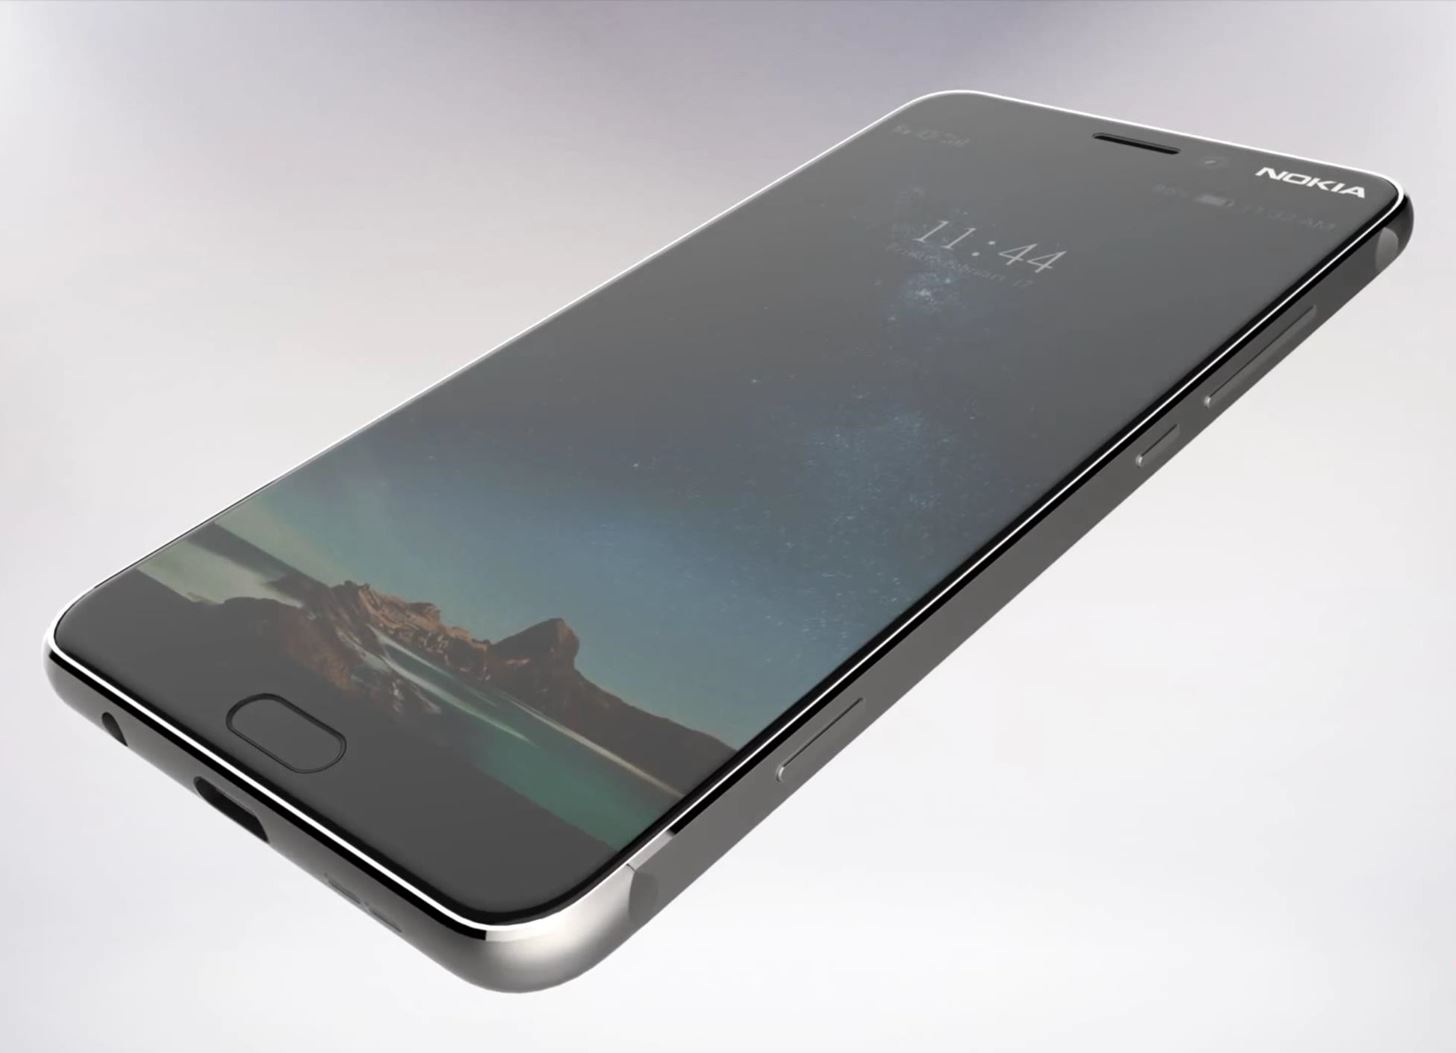 Nokia 8/P1 Rumor Roundup—Snapdragon 835 Processor, 22.3 MP Camera, 6 GB RAM & More